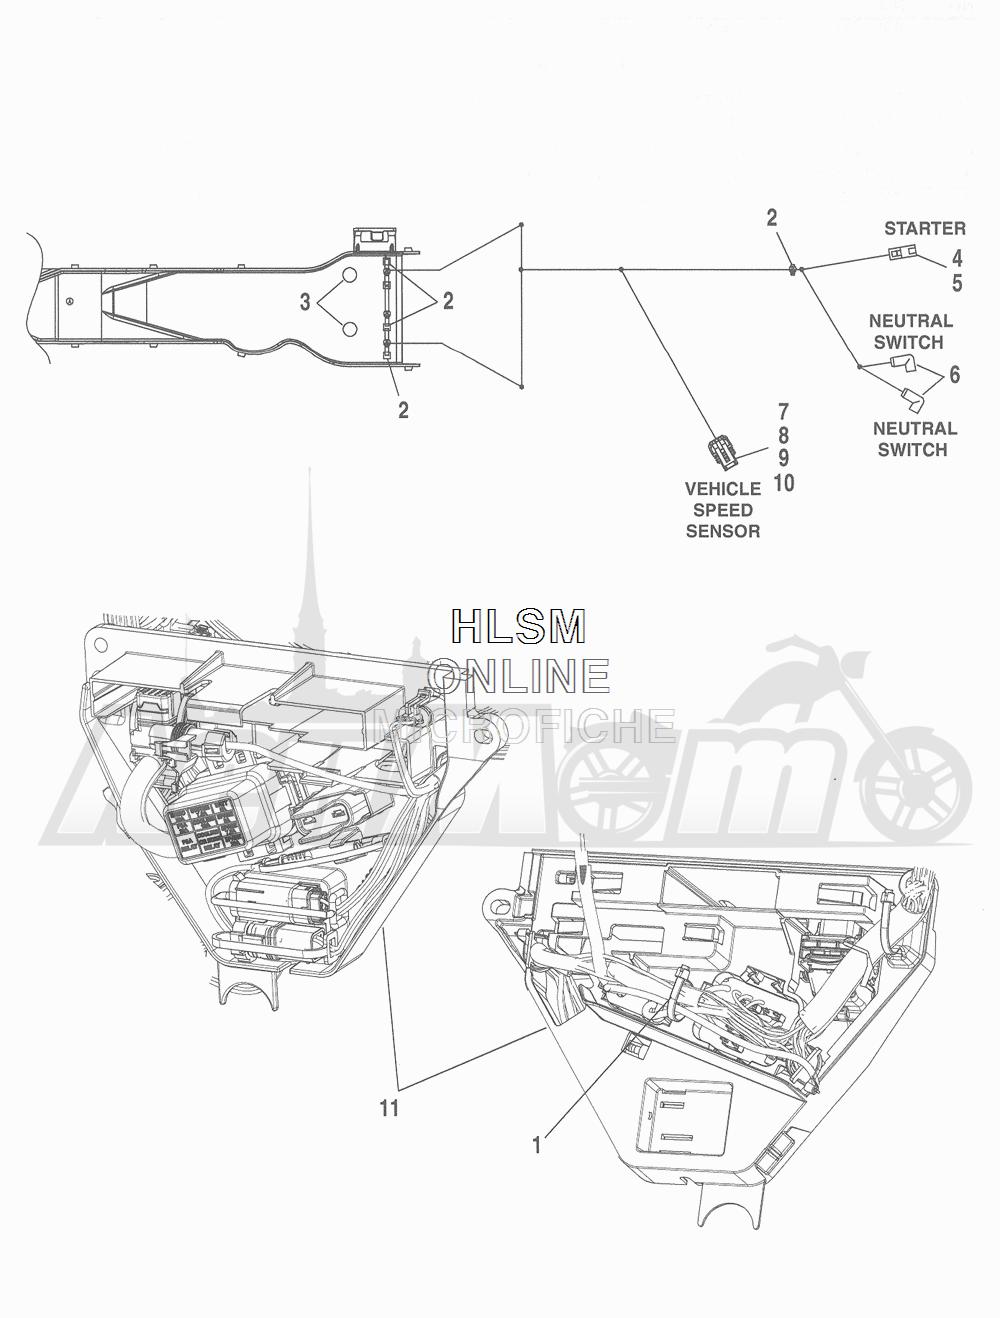 Запчасти для Мотоцикла Harley-Davidson 2016 FLHRC ROAD KING CLASSIC (FRM) Раздел: WIRING HARNESS_ MAIN - ABS (NON-FAIRING MODELS) - 6 | электропроводка главный жгут ABS (не модели с обтекателем) 6